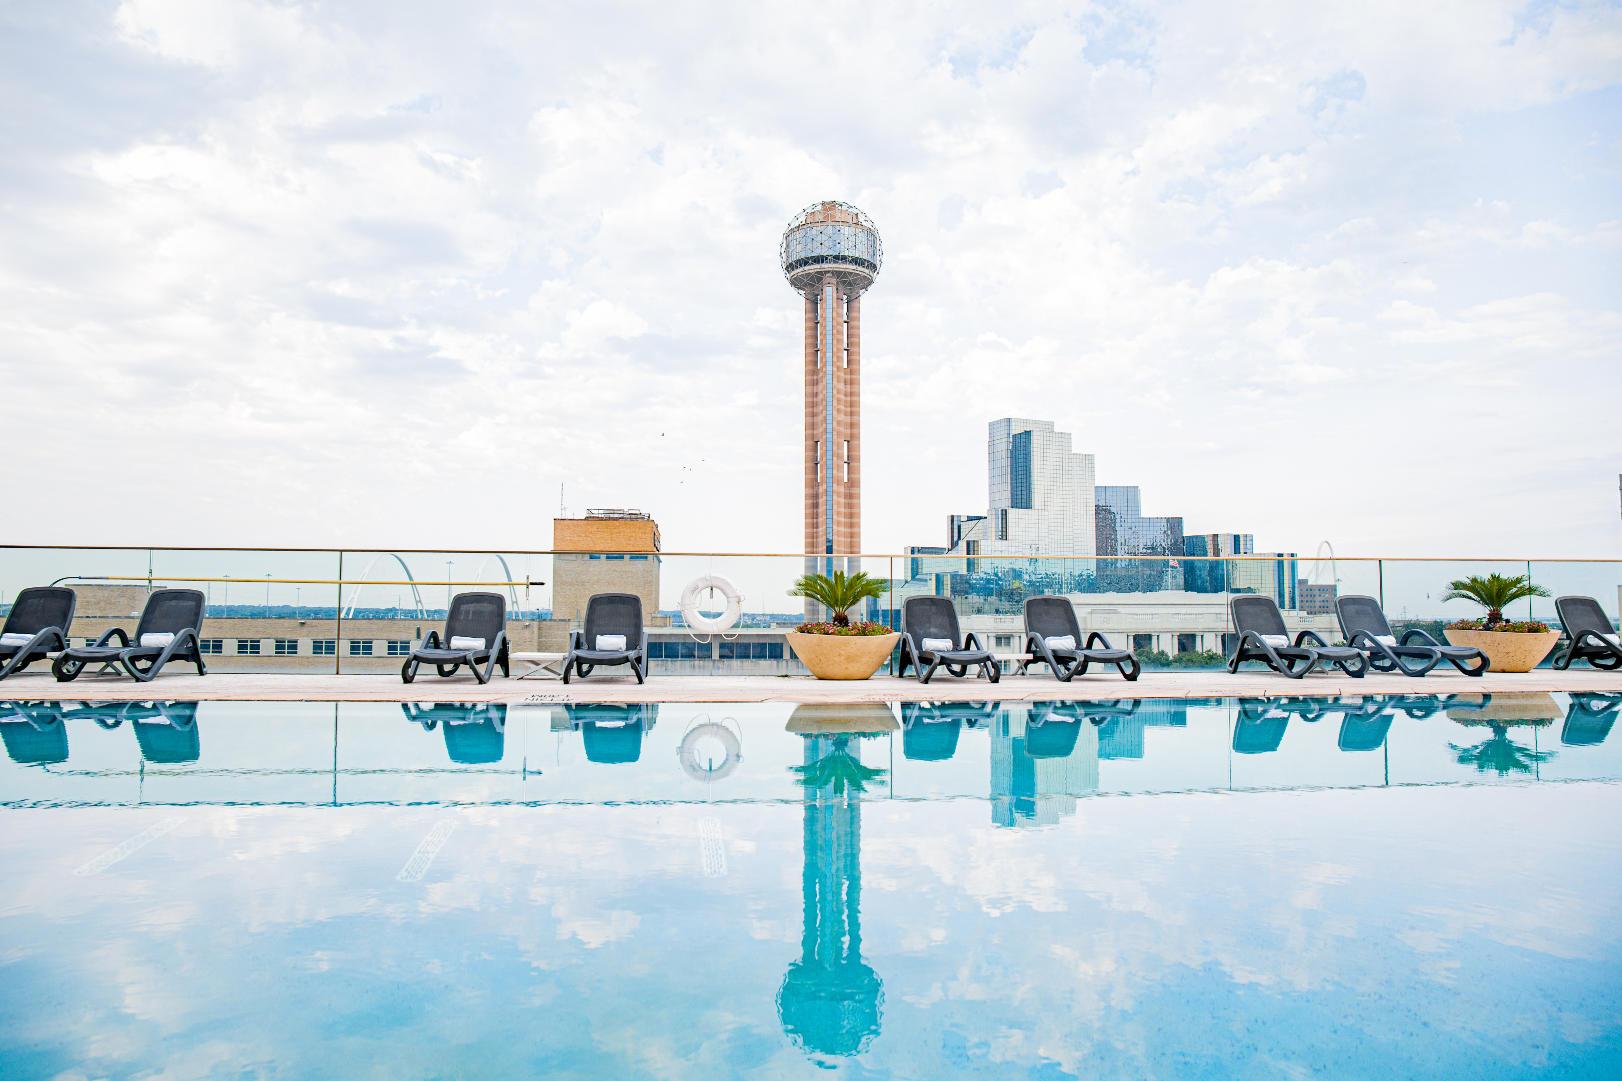 The Omni Hotel pool